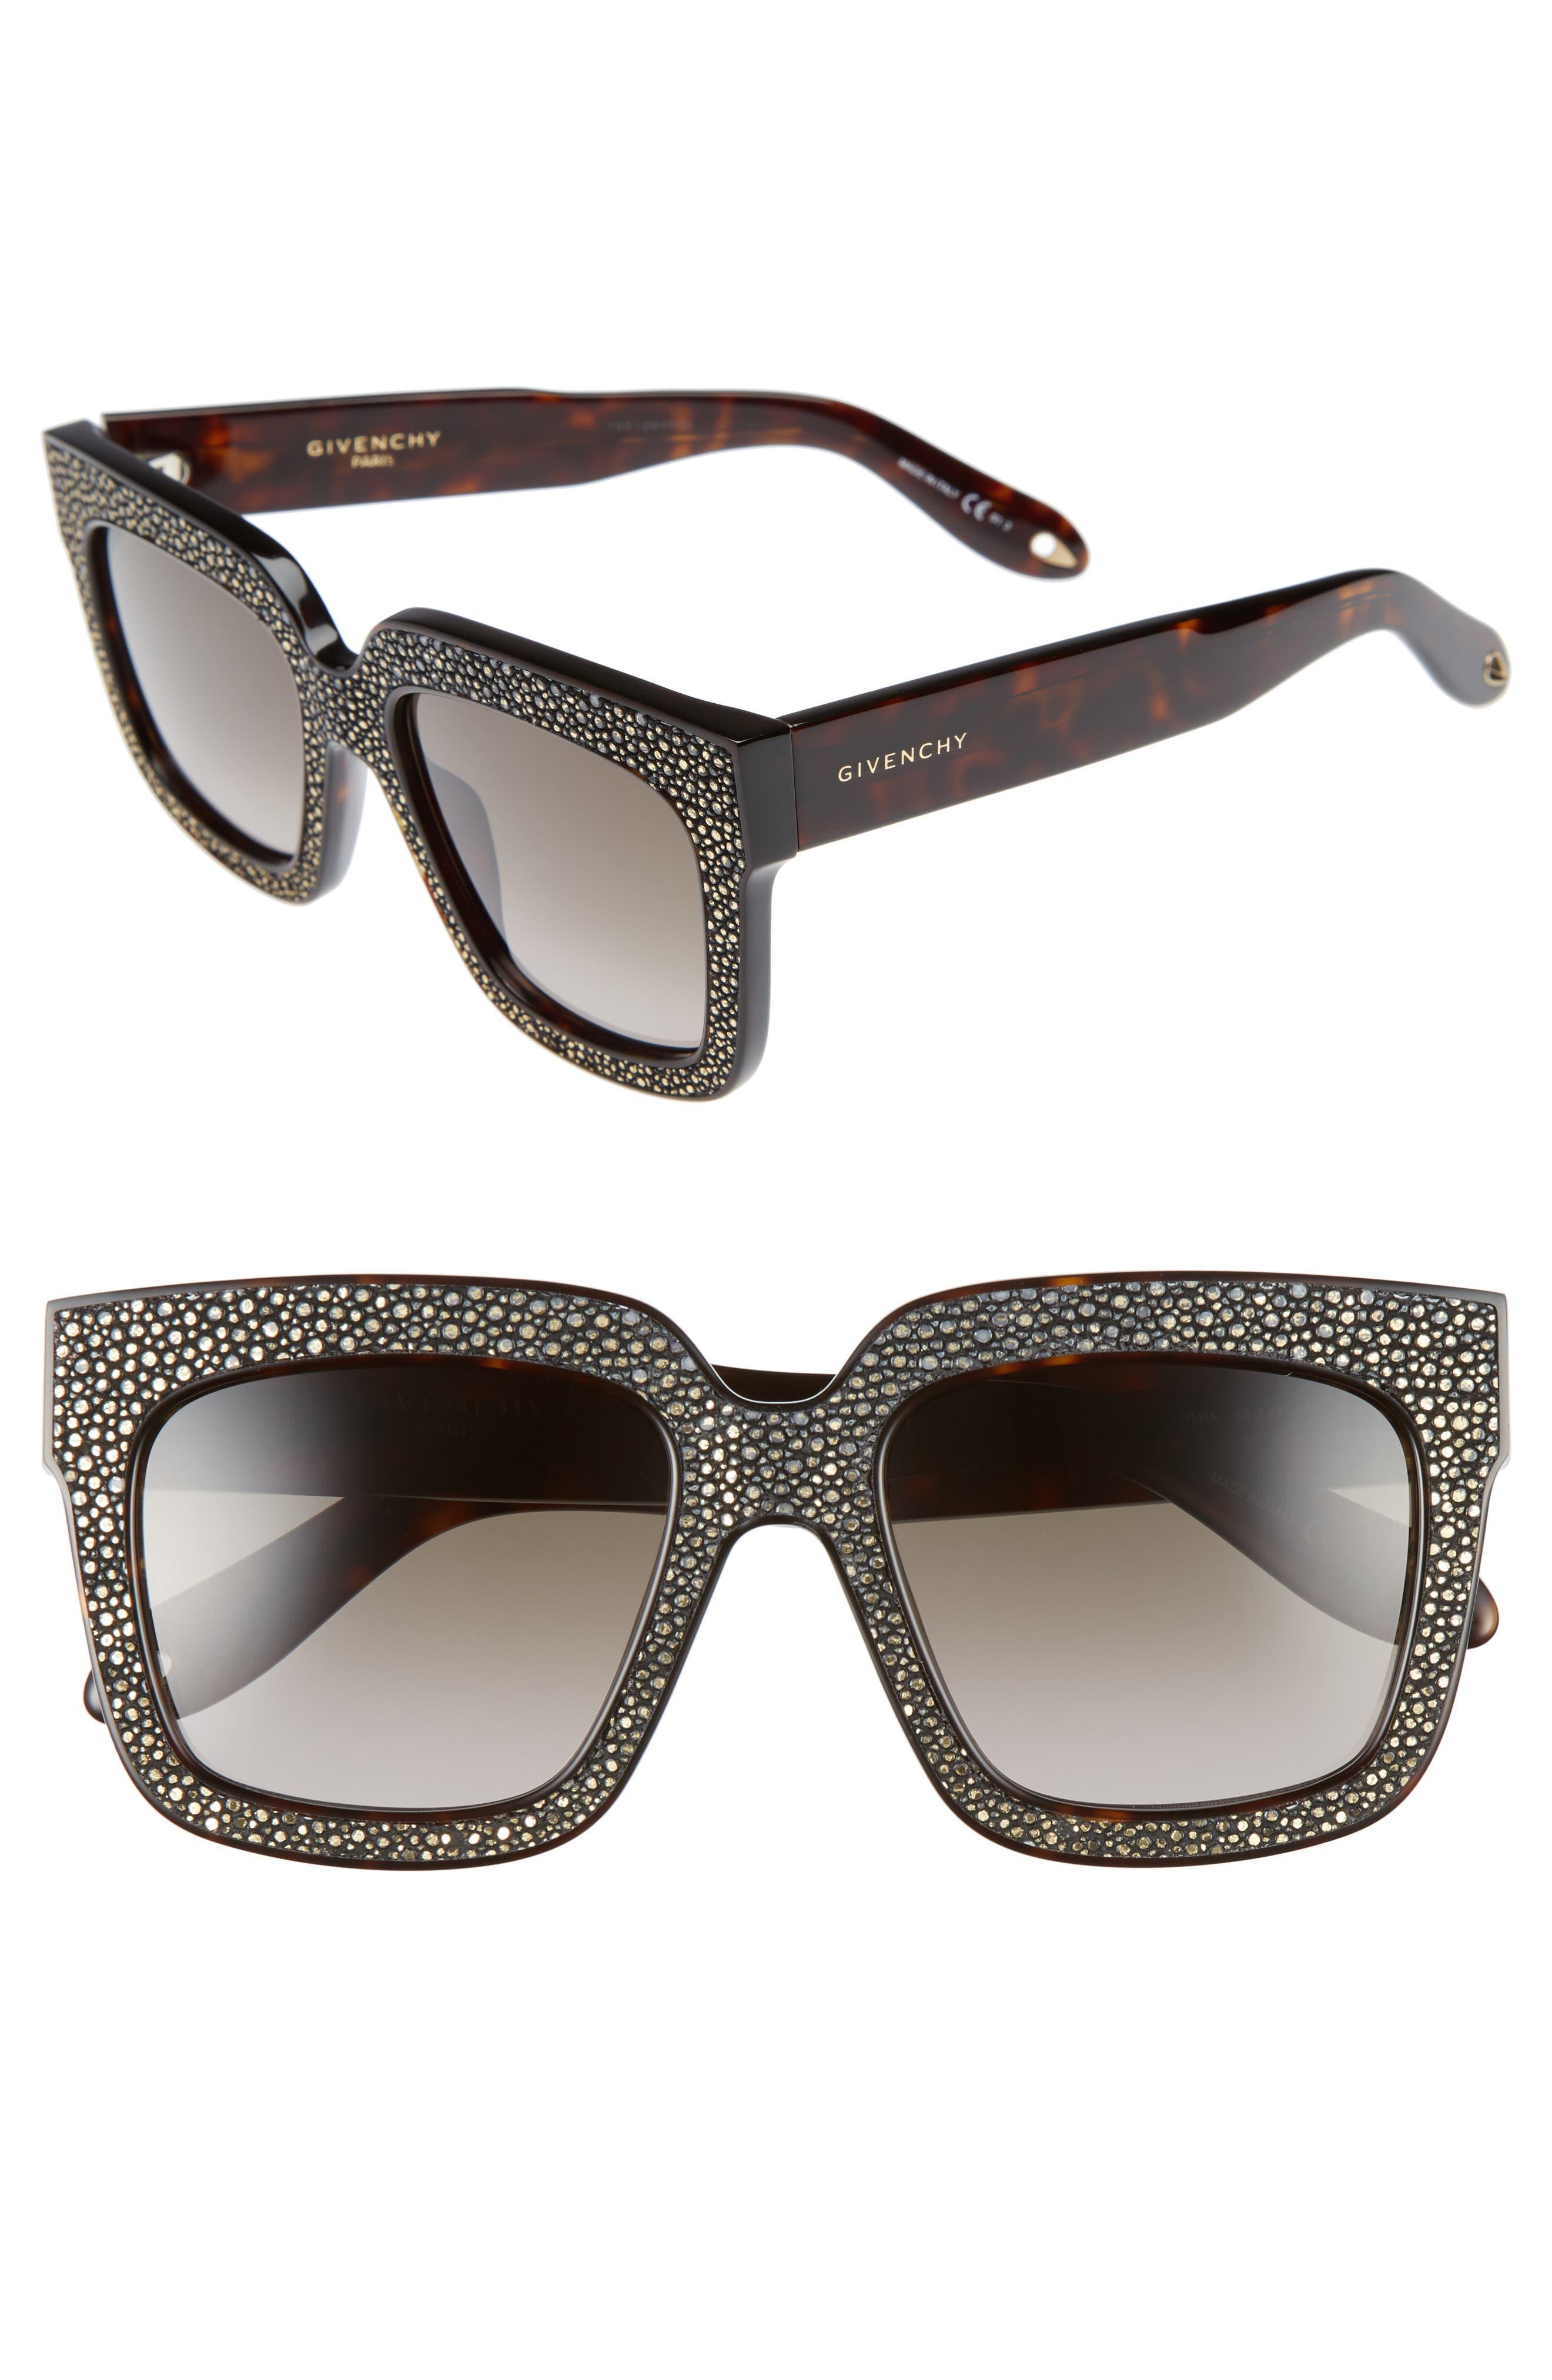 Main Image - Givenchy 53mm Square Sunglasses